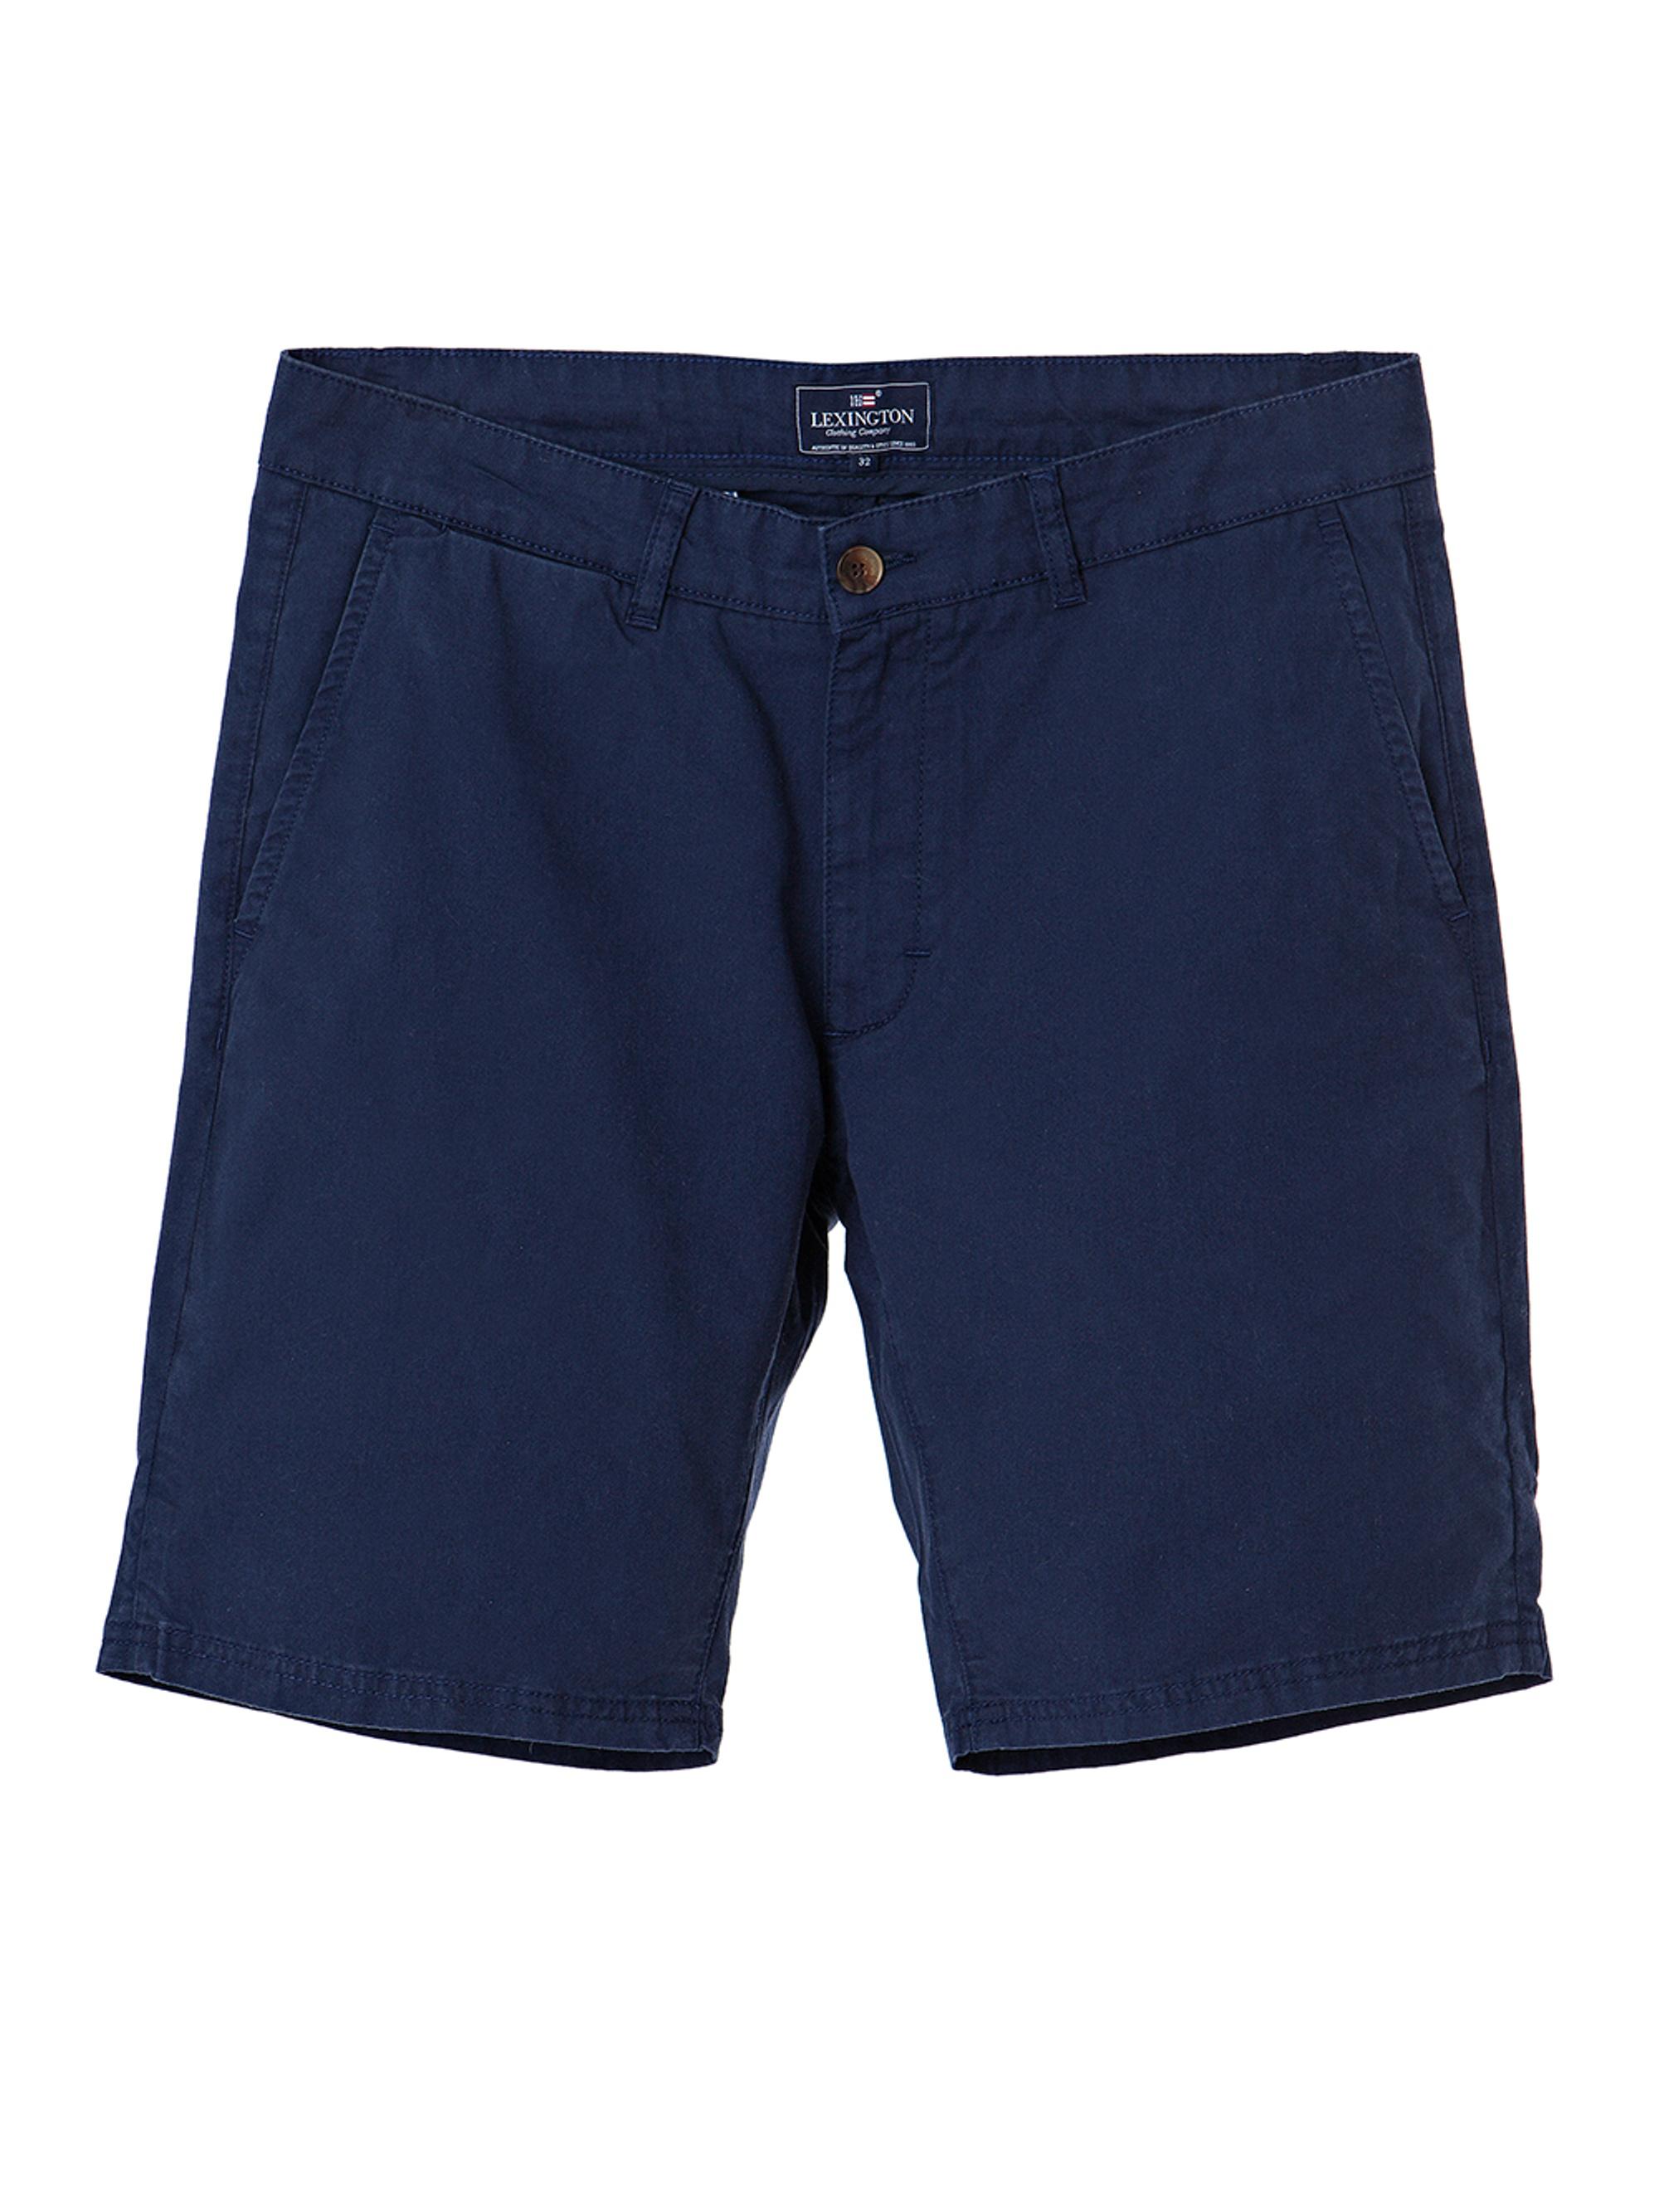 Gavin Chino Shorts, Deepest Blue